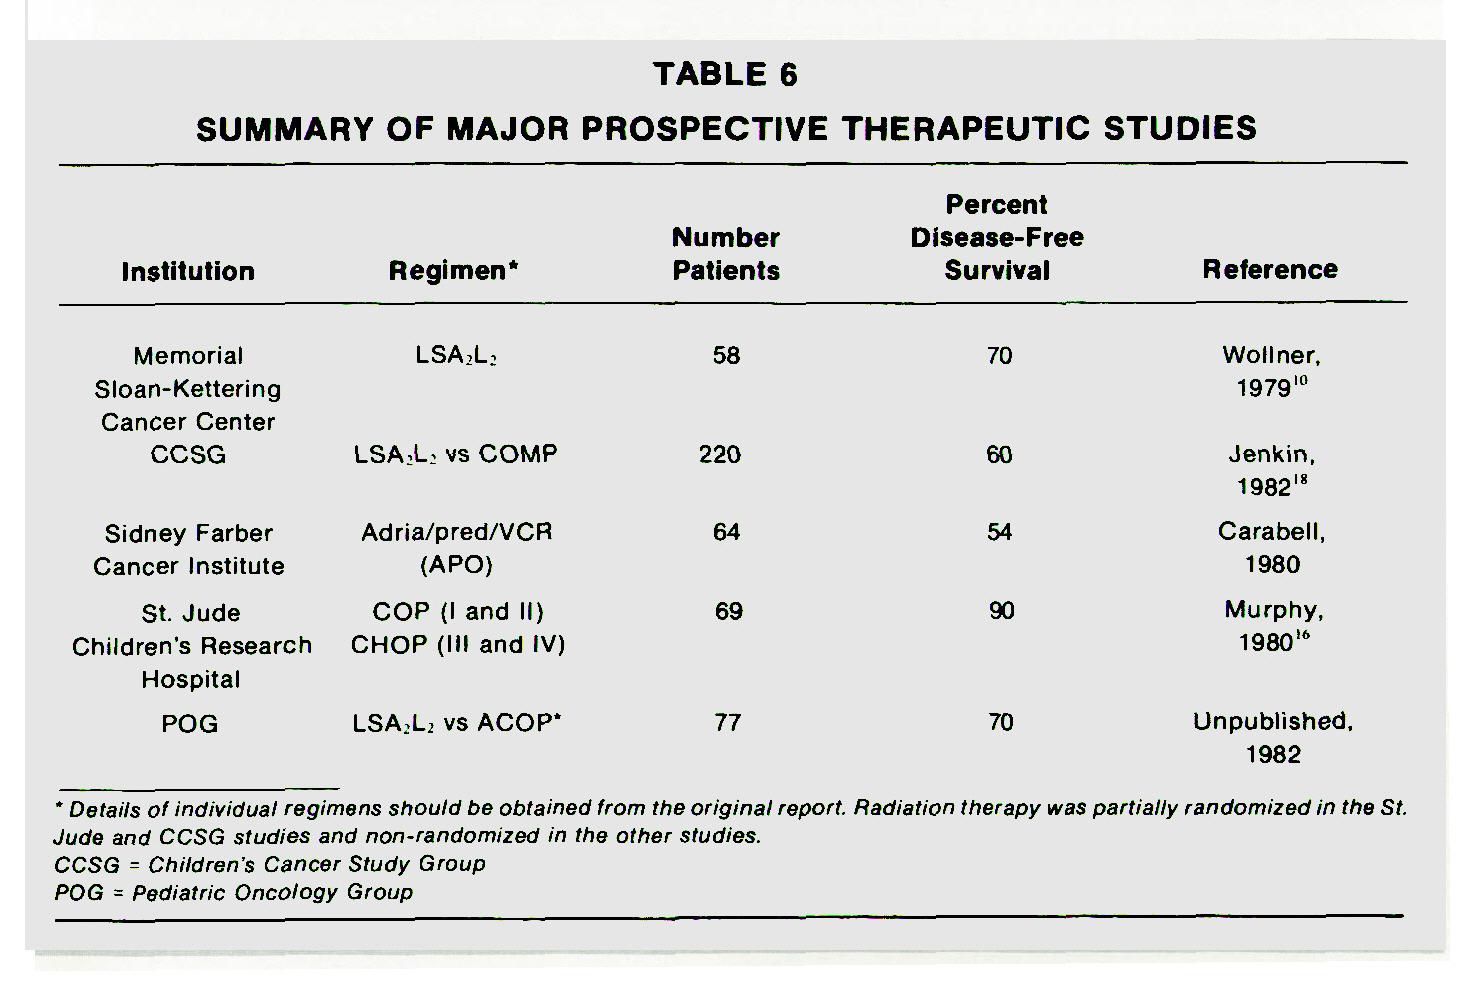 TABLE 6SUMMARY OF MAJOR PROSPECTIVE THERAPEUTIC STUDIES